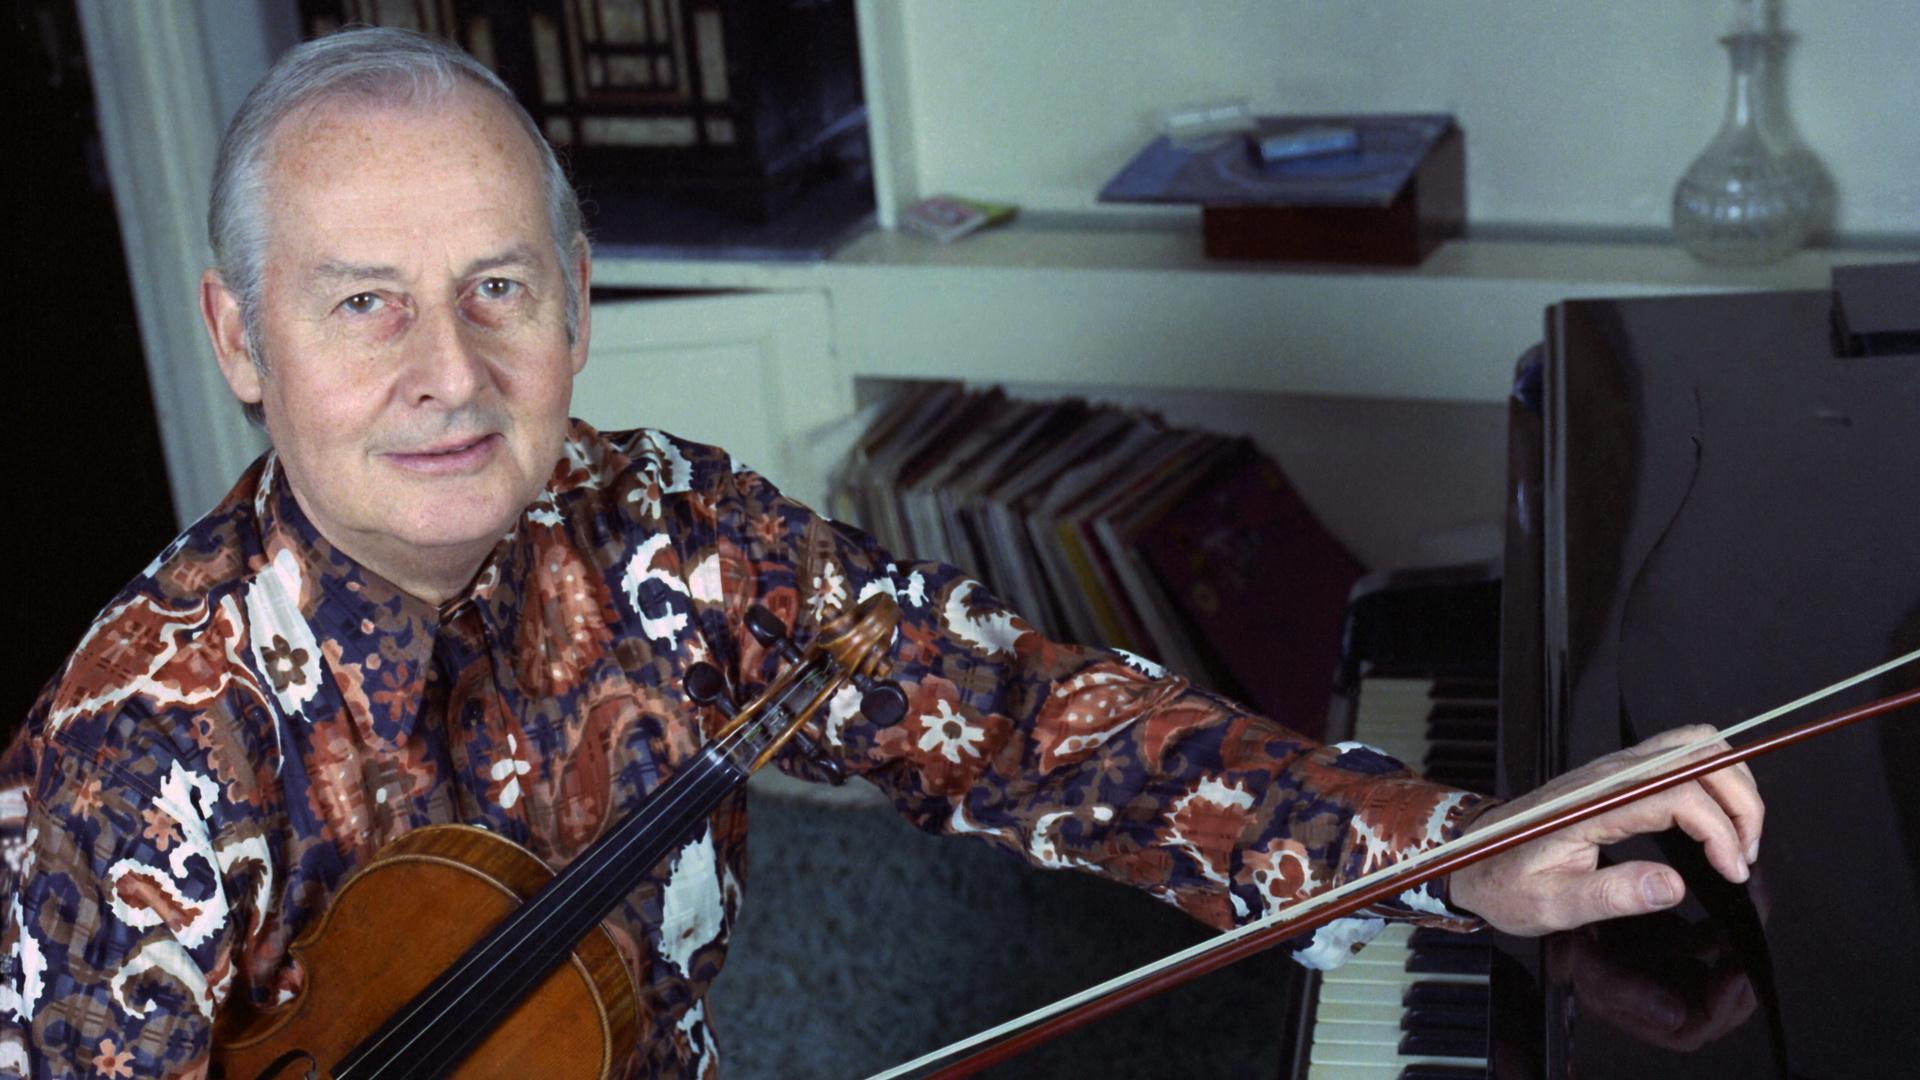 Stéphane Grappelli